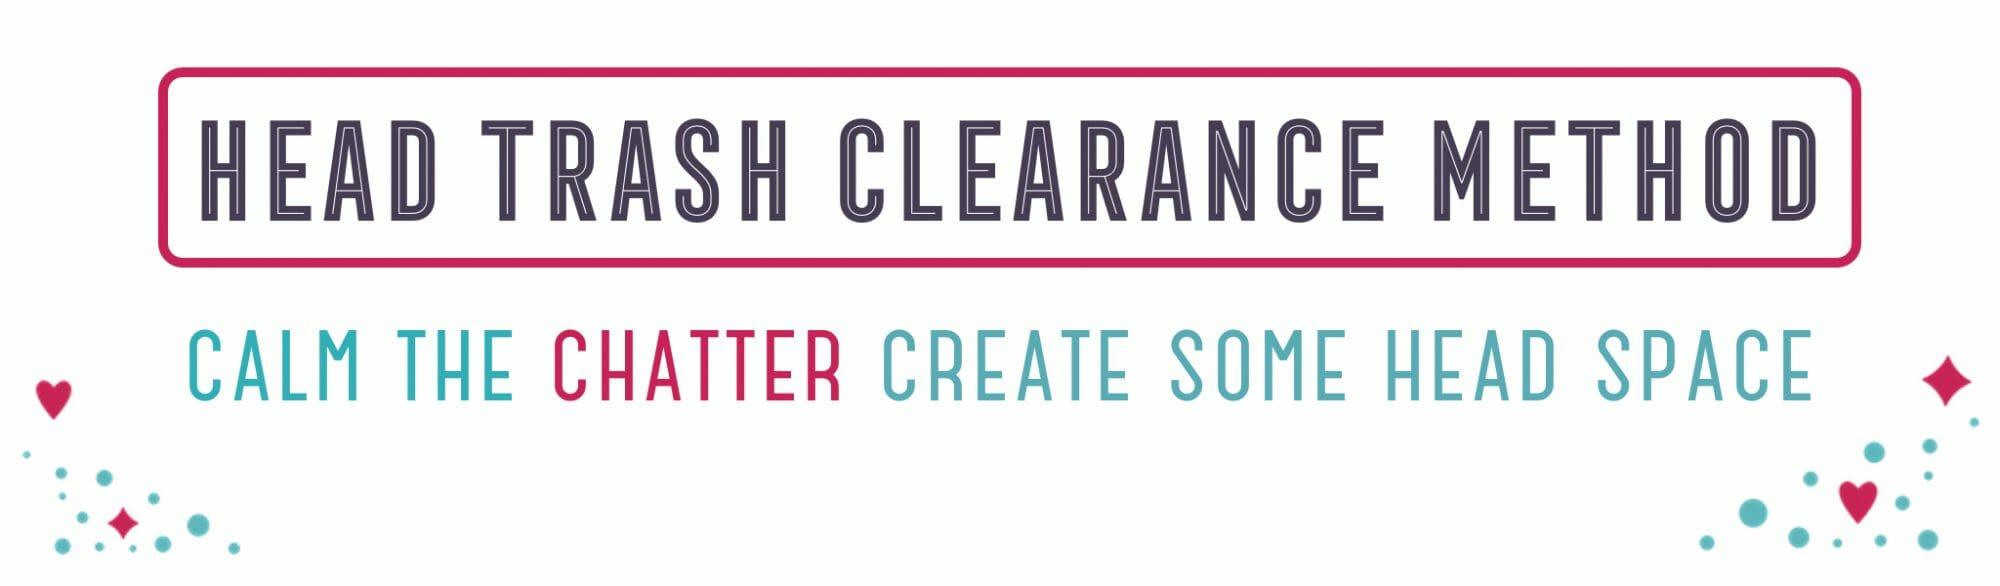 head trash clearance method